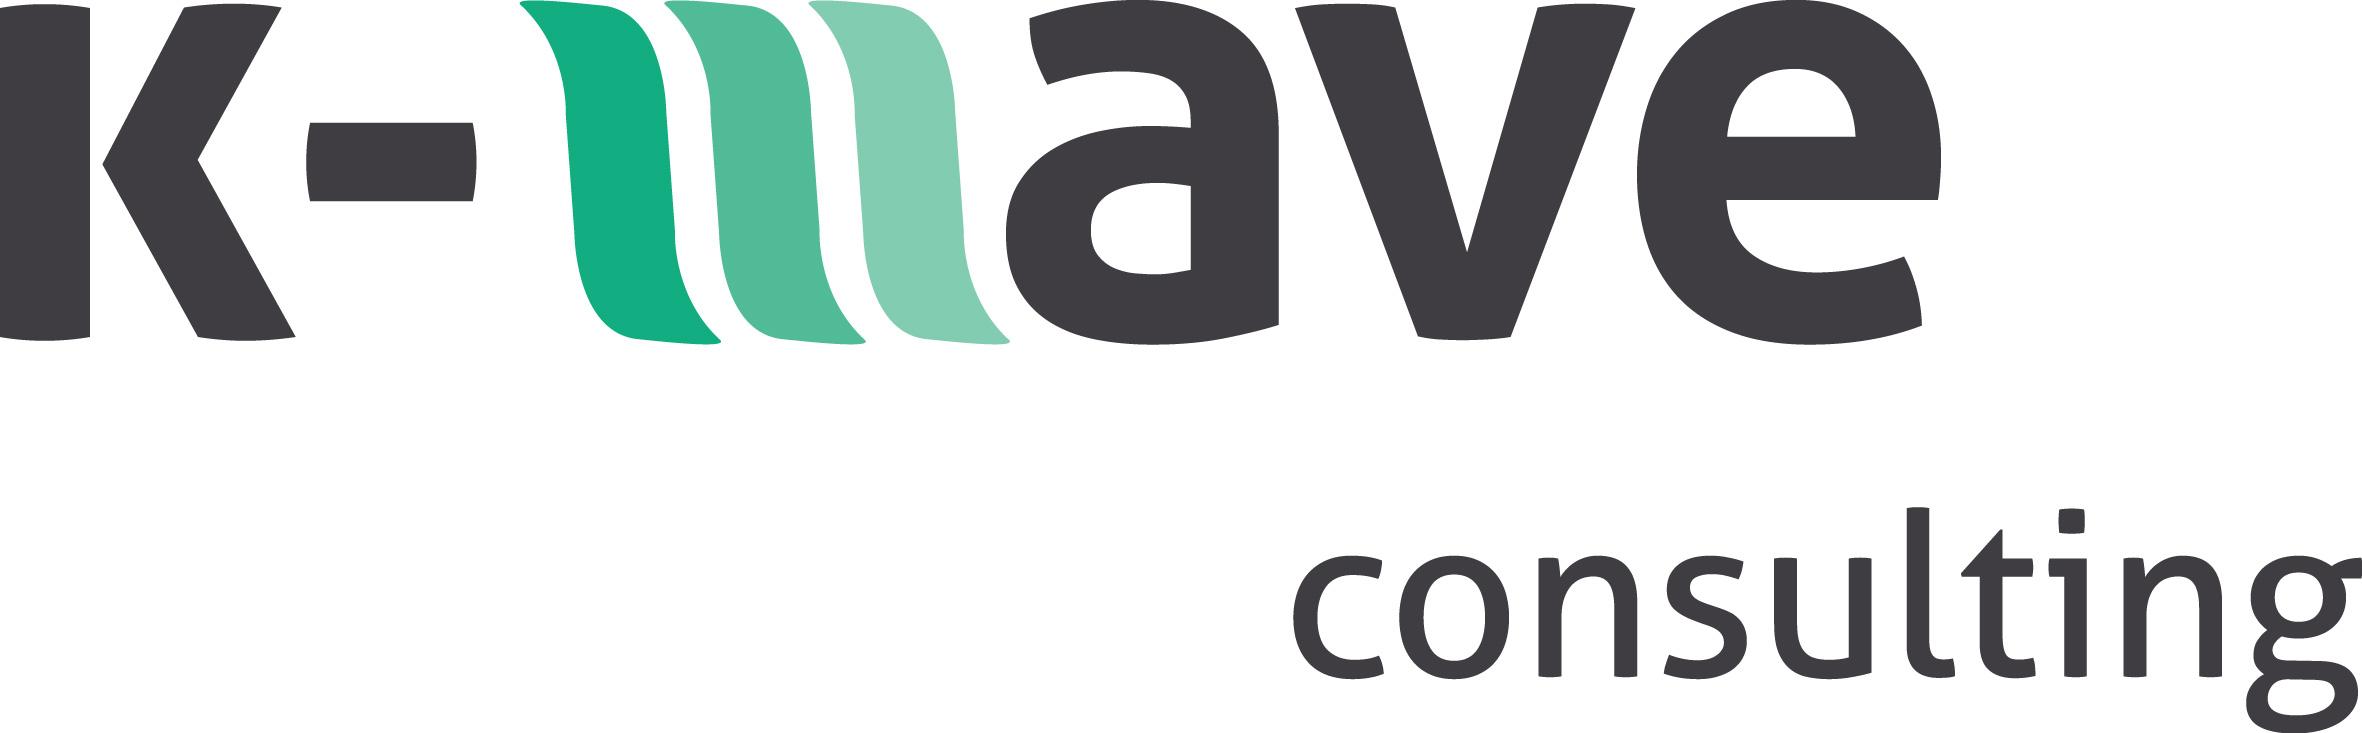 Logo_k-wave_RGB.jpg